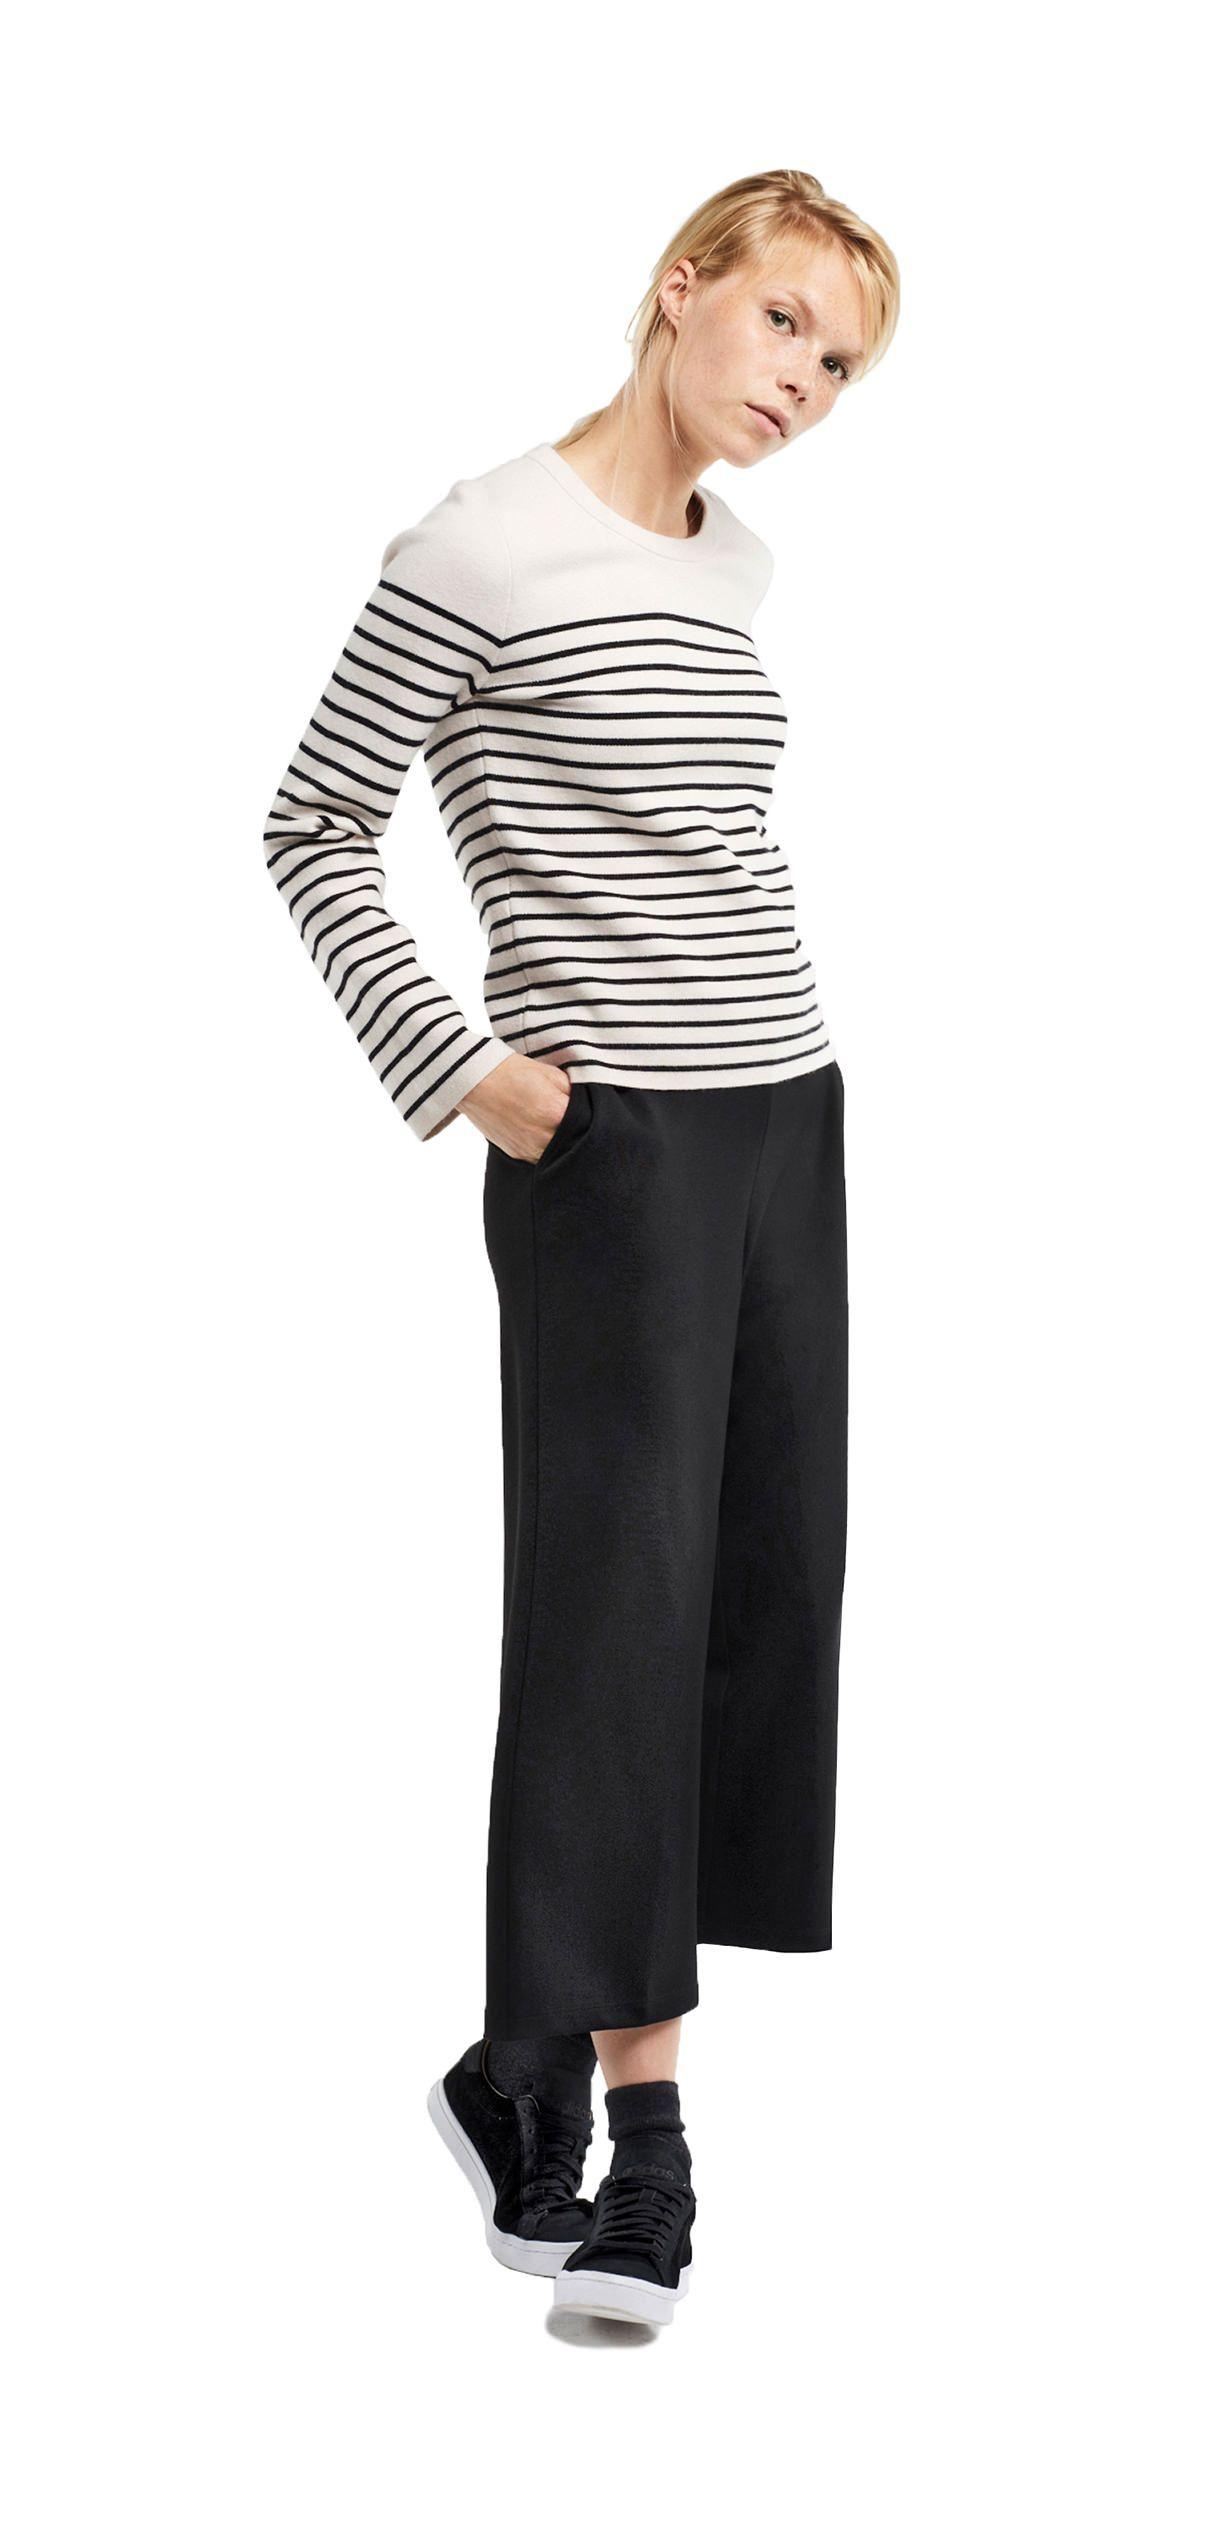 damen outfit komfortabler dandy look von opus fashion gestreifter pullover let 39 s get dressed. Black Bedroom Furniture Sets. Home Design Ideas